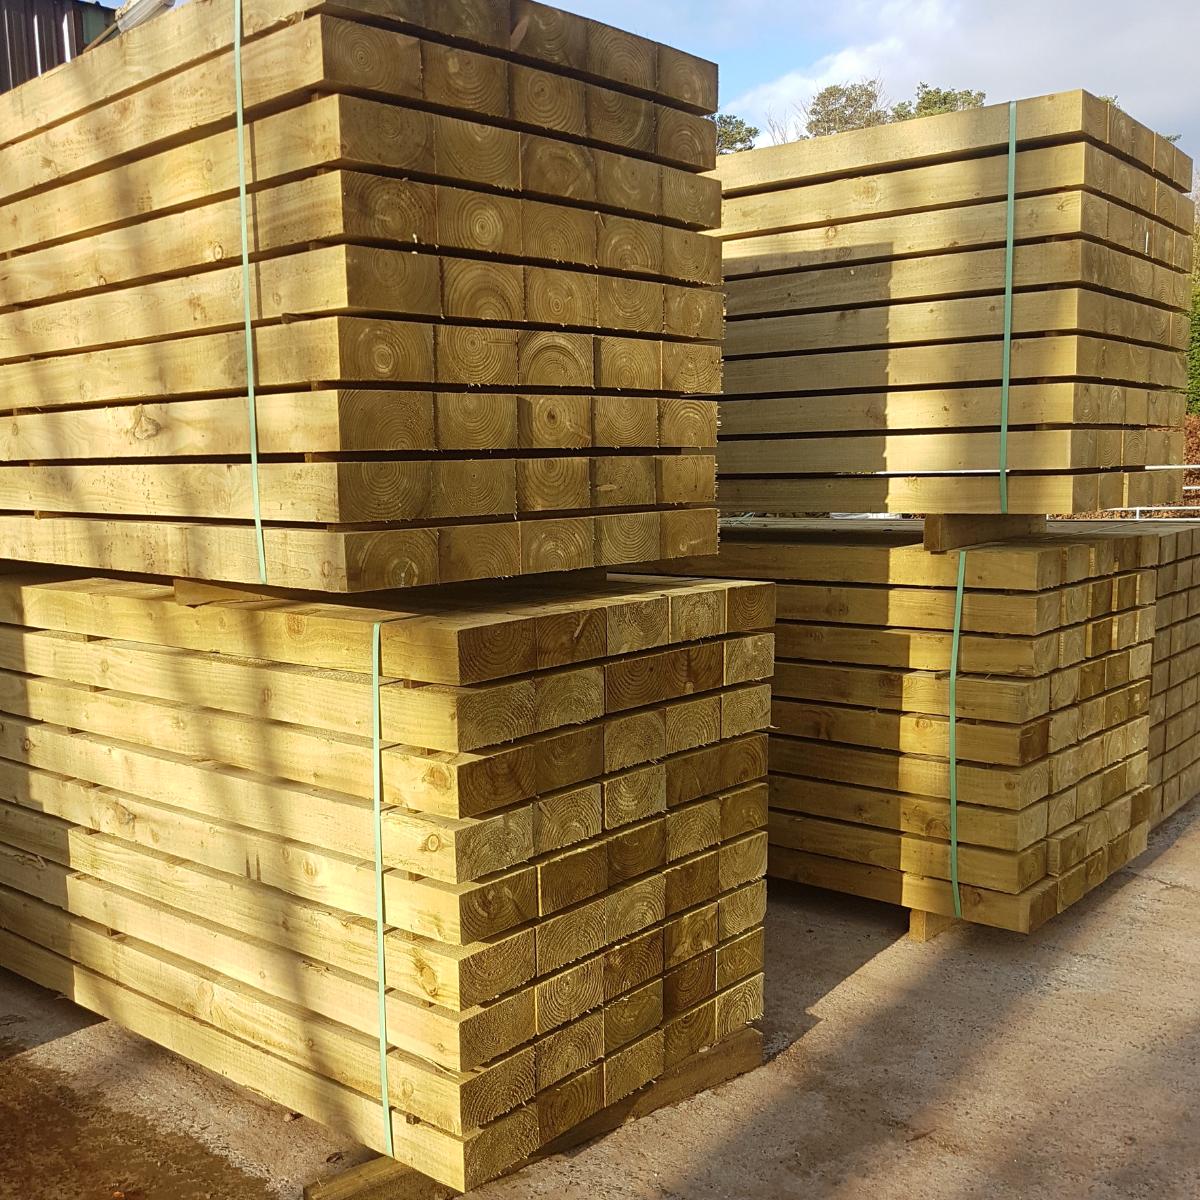 timber railway sleepers stacked mitchell turf